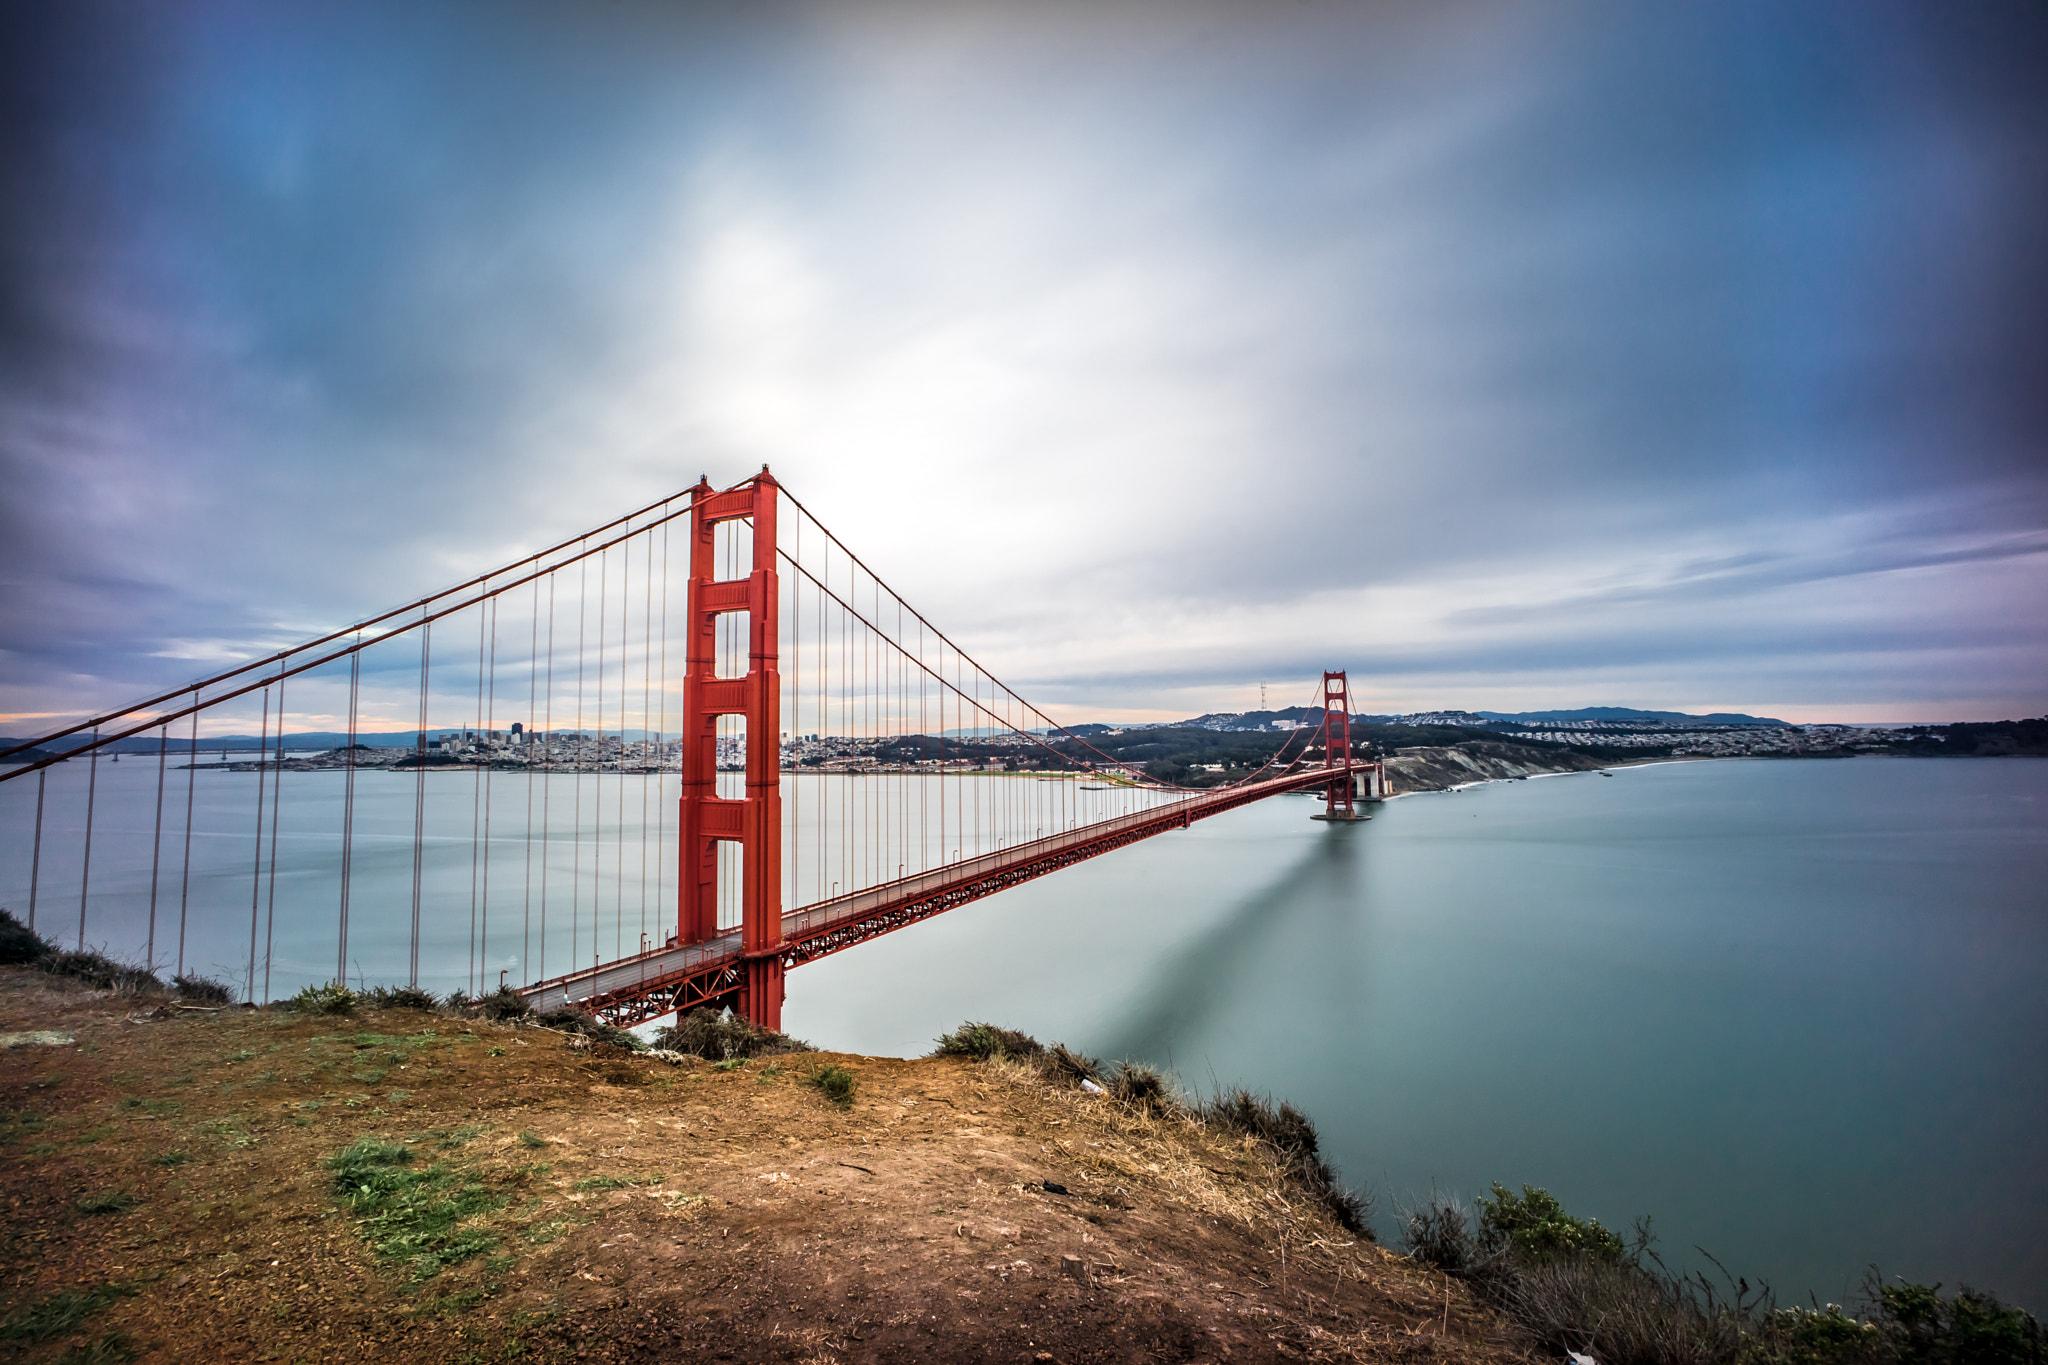 The Golden Gate Bridge San Francisco United States (90321677).jpeg